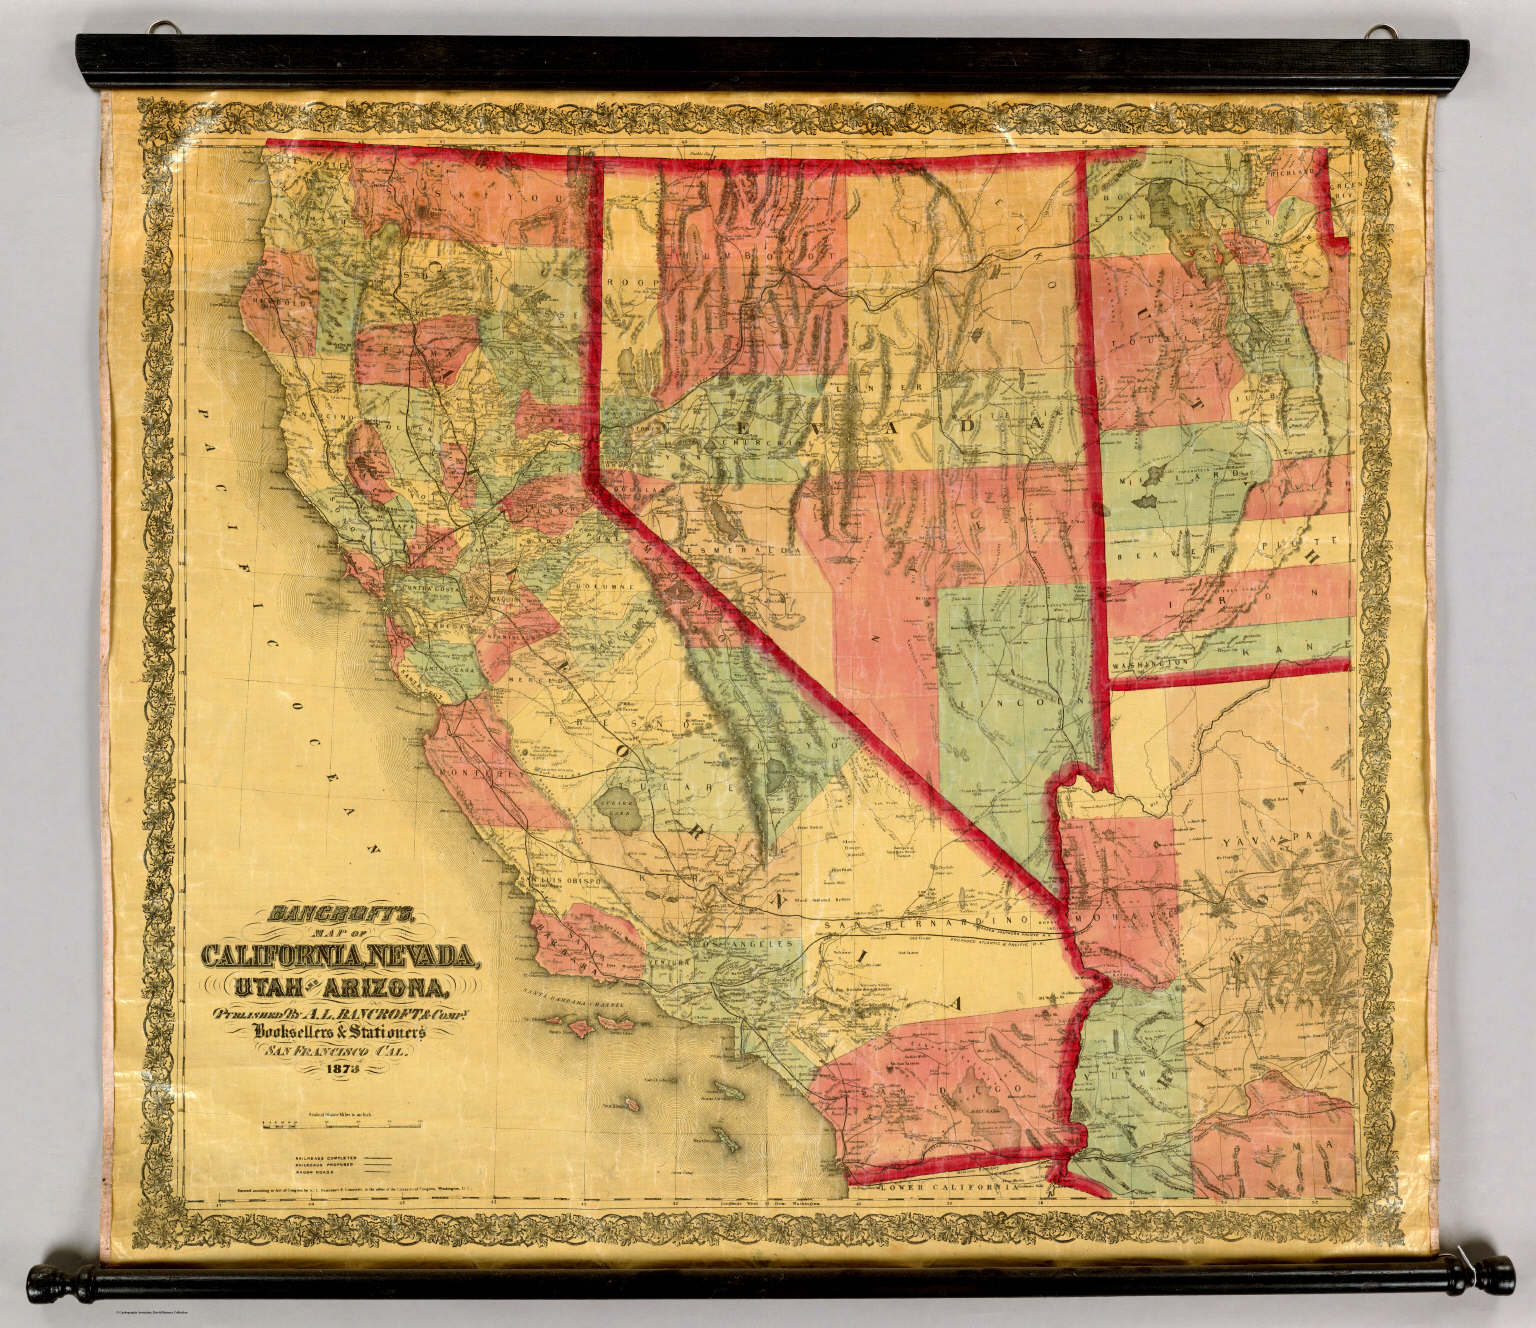 Map Of Nevada And Arizona.Bancroft S Map Of California Nevada Utah And Arizona David